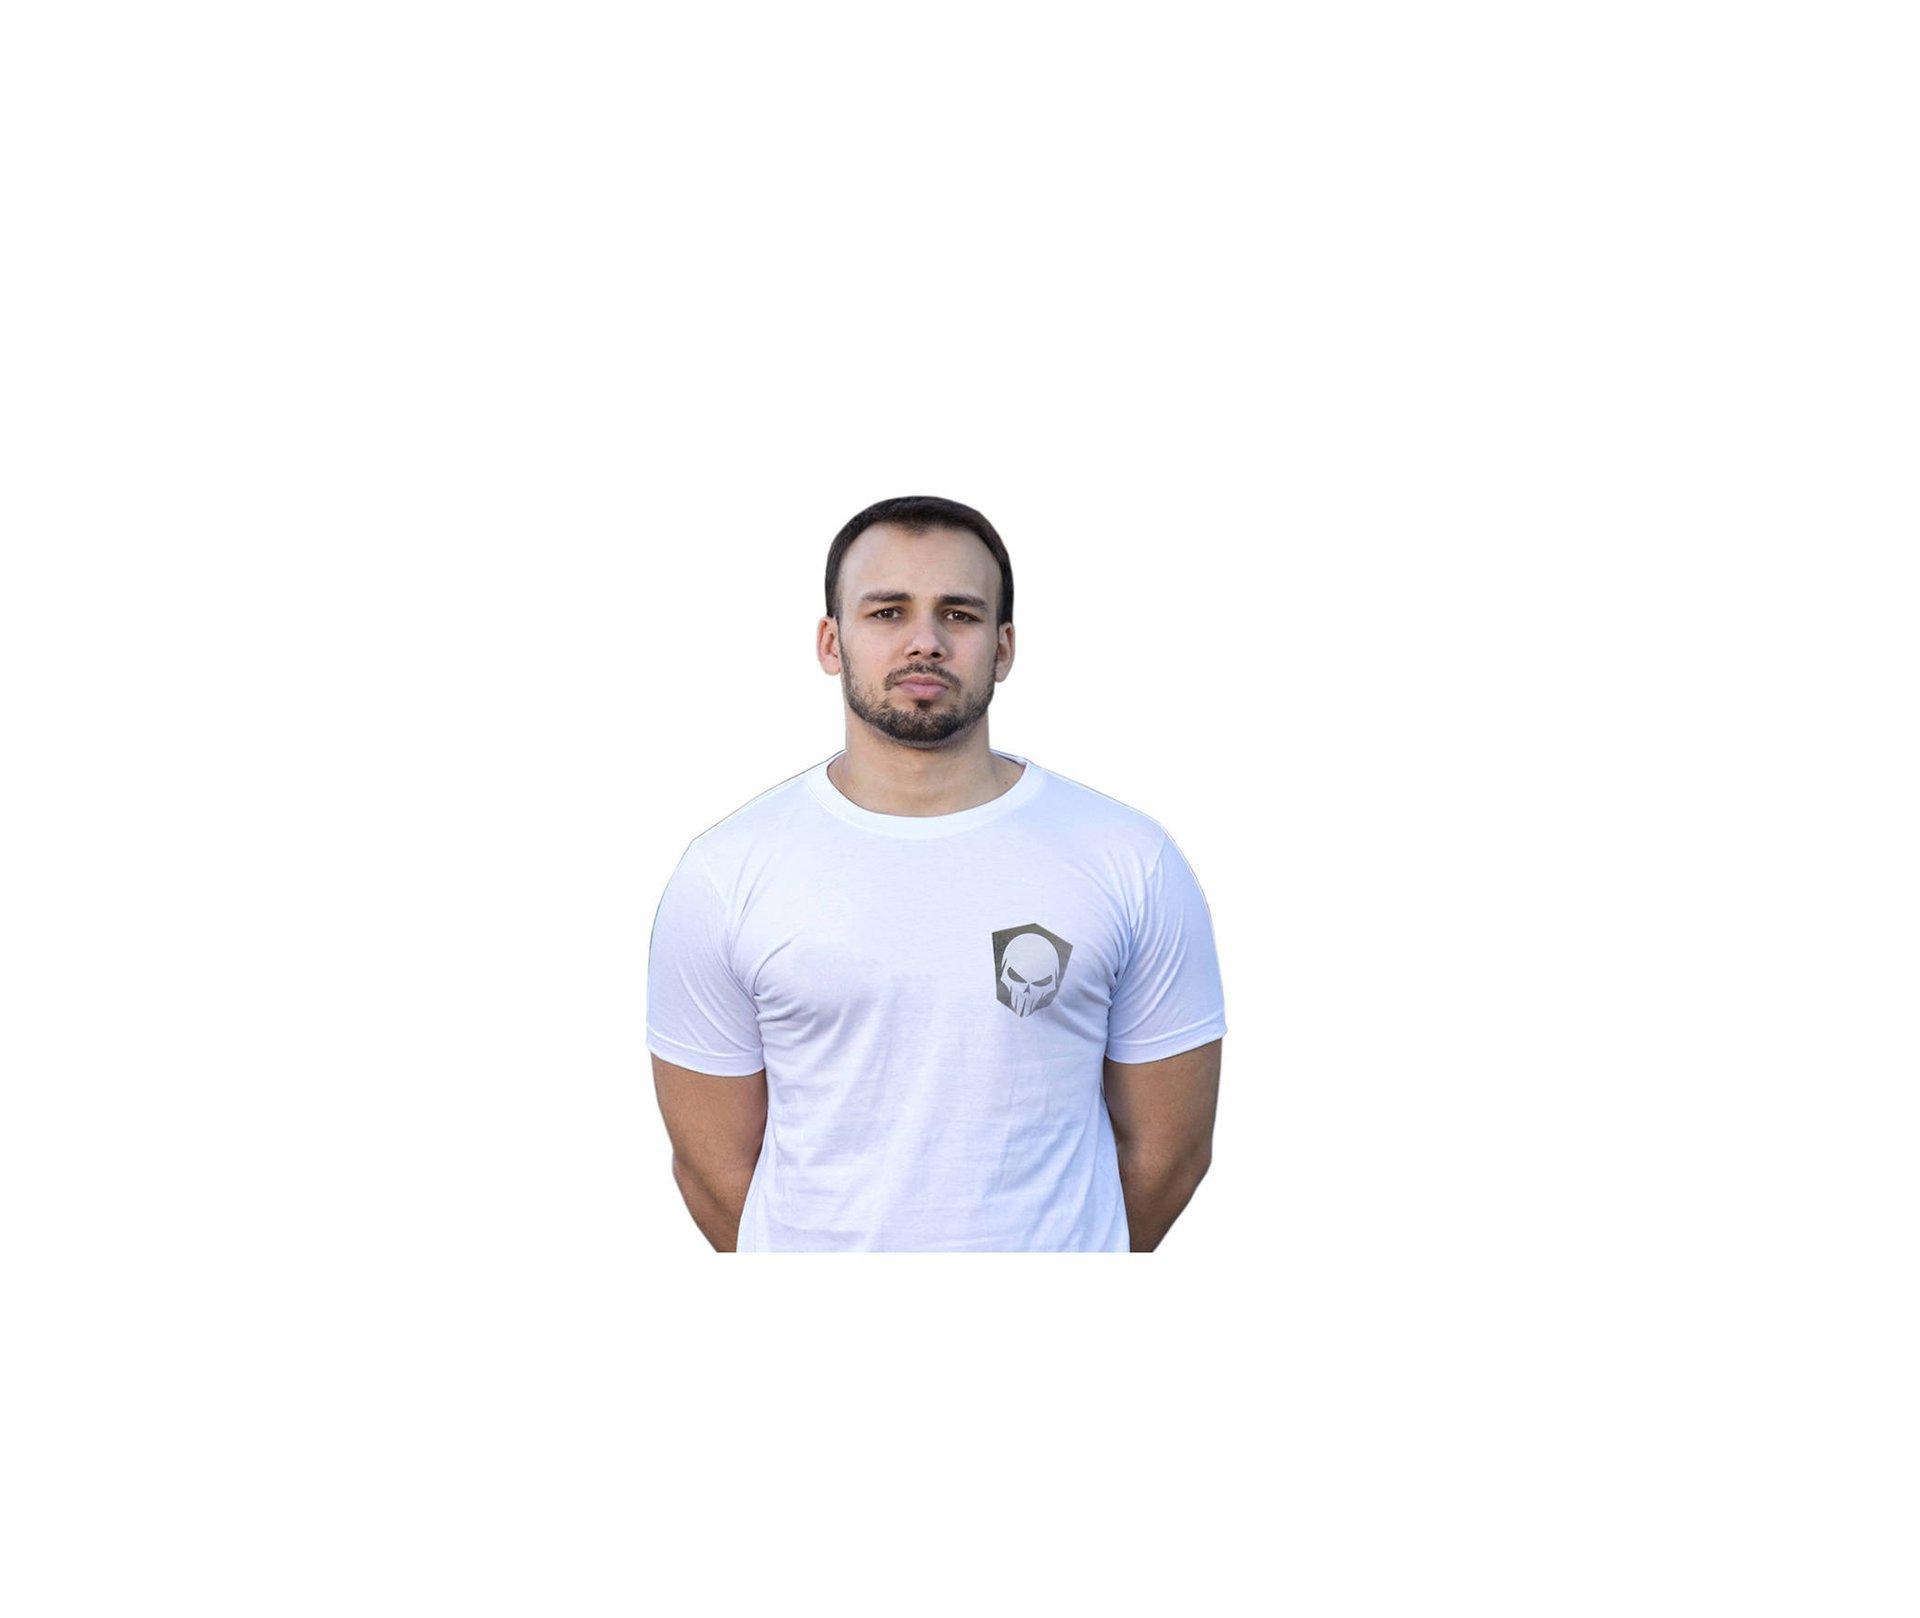 Camiseta Estampada Caveiras Bravo 9- Branca - Bravo